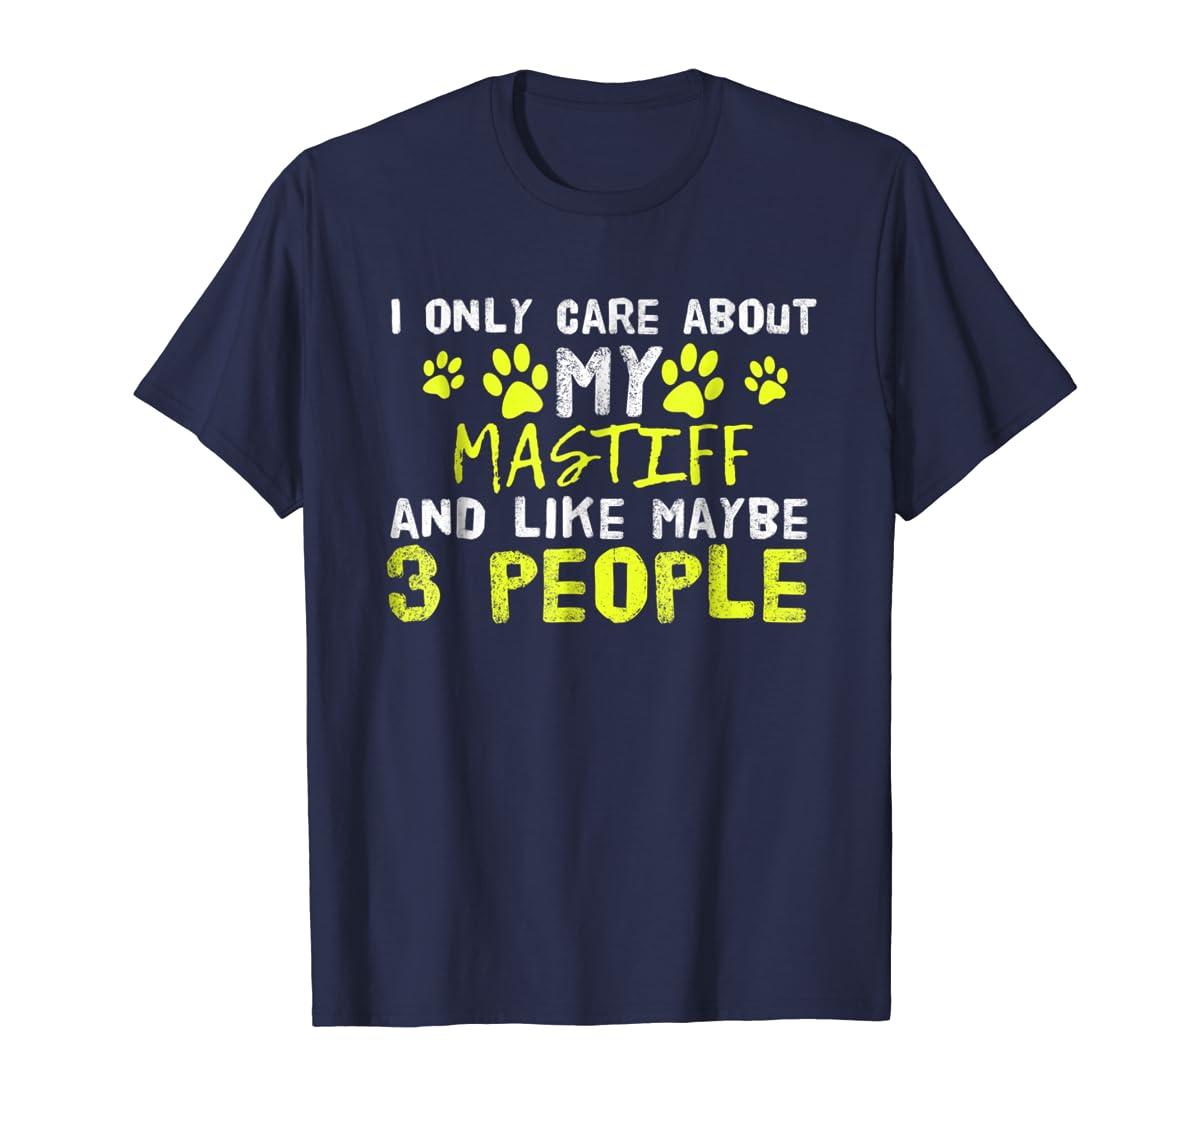 Mastiff Dog Shirt Introvert Love My Dog Tee-Men's T-Shirt-Navy